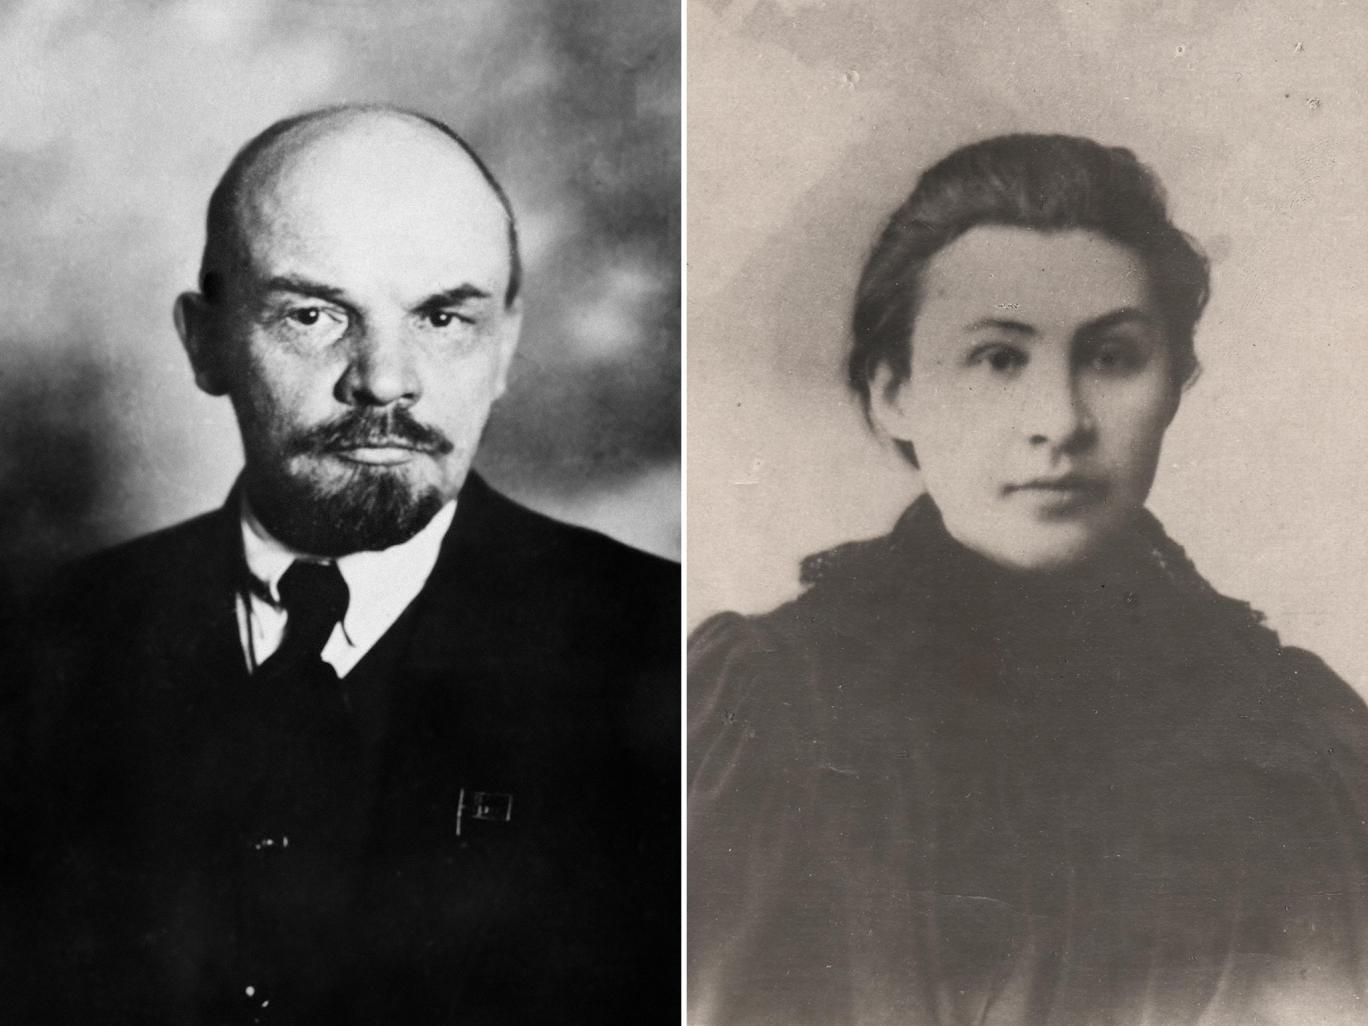 Apollinariya Yakubova The Face Of Woman Vladimir Lenin Loved Saem Woo Eyebrow Brown 01 Most Is Revealed Independent